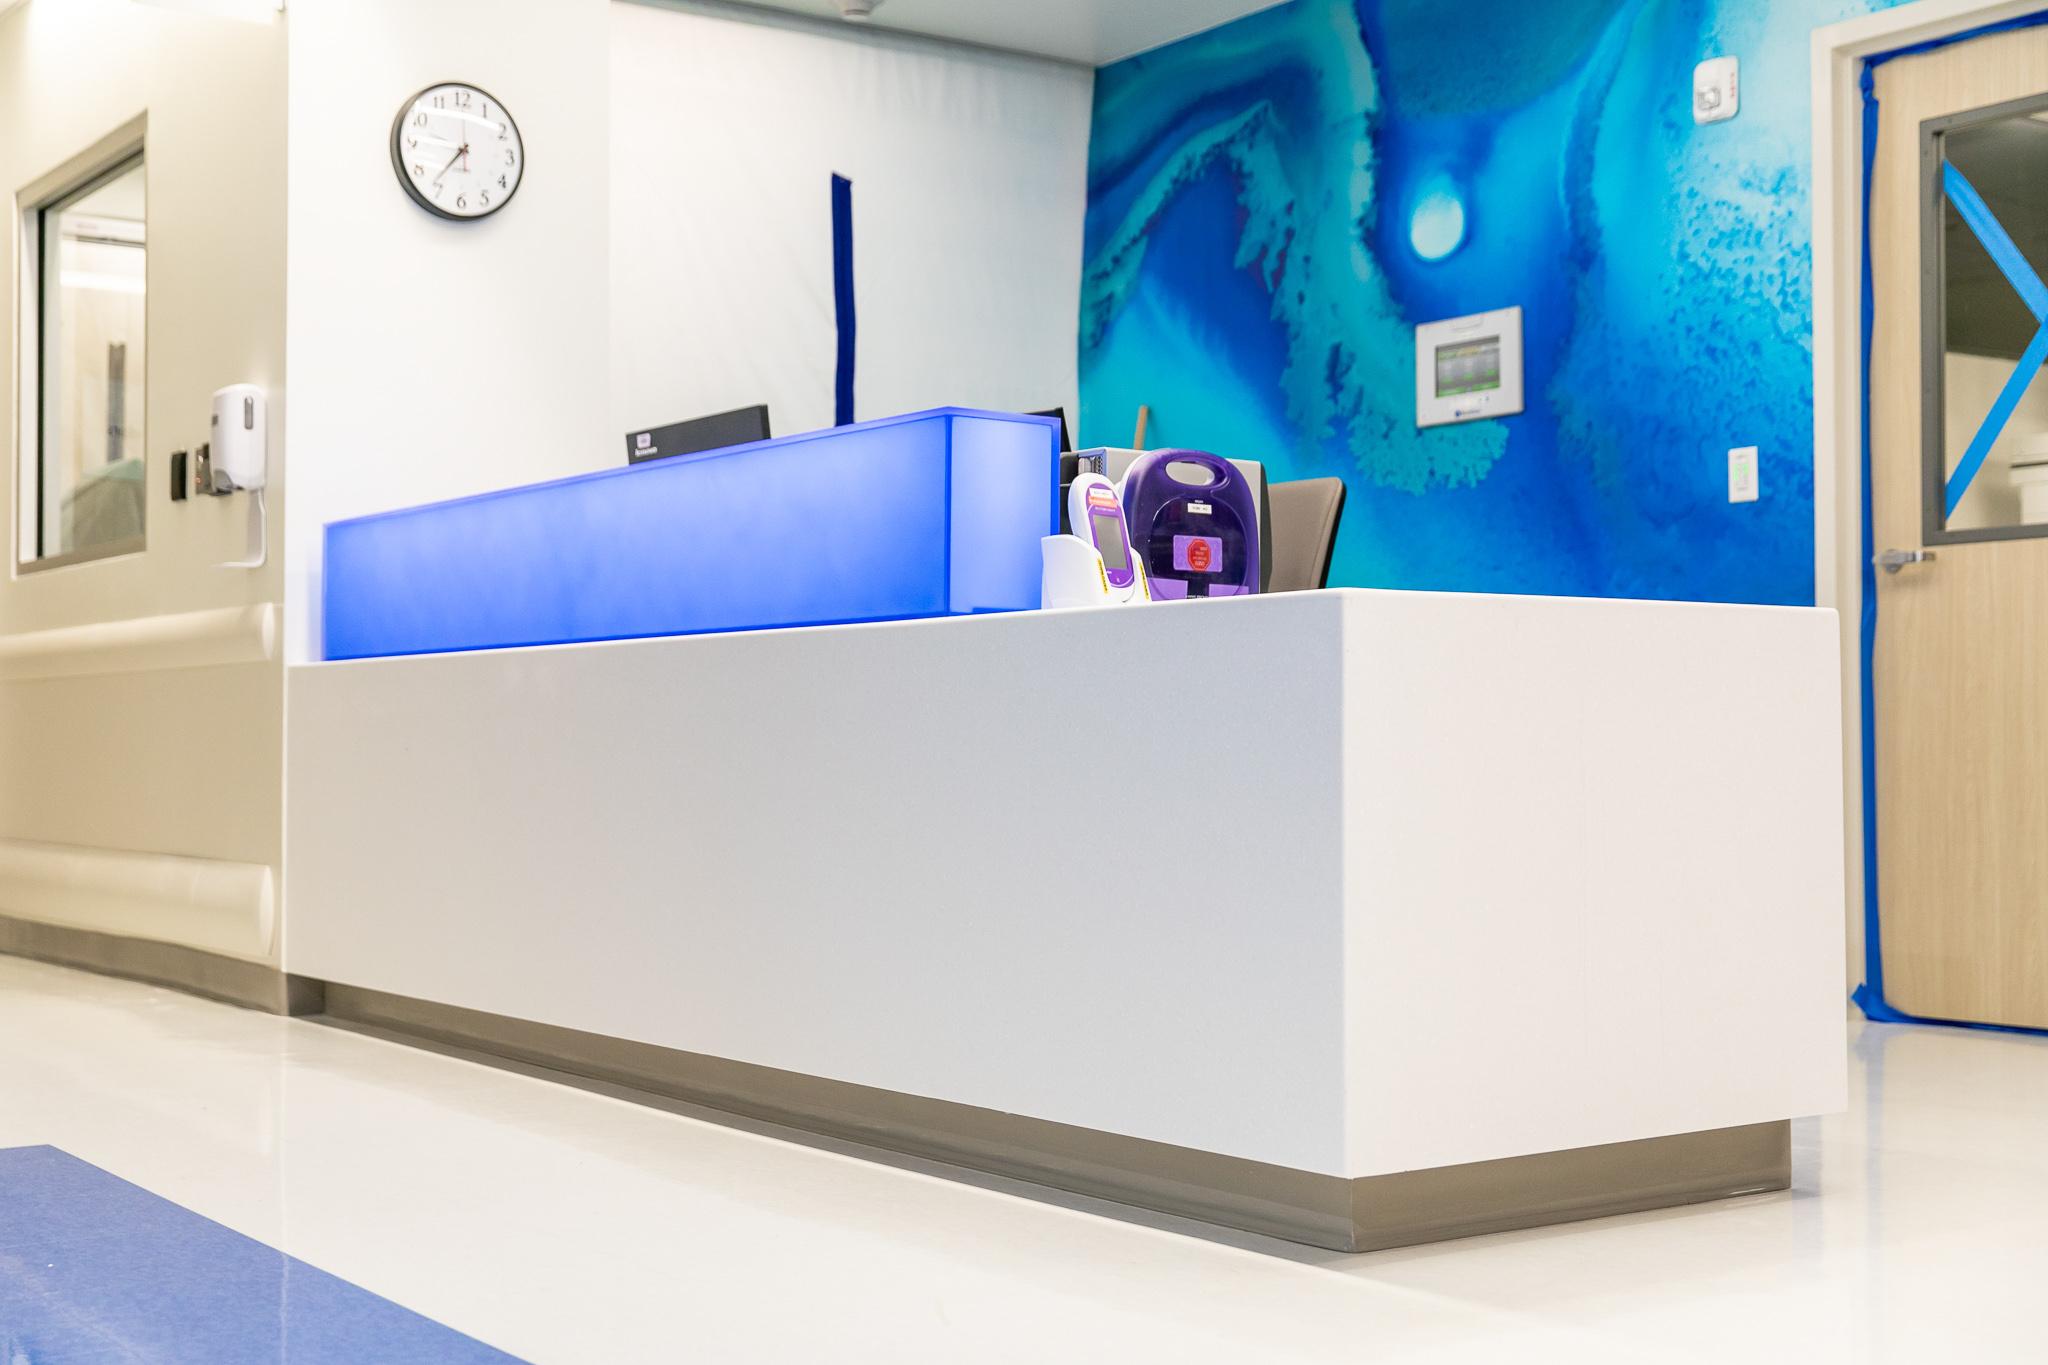 OLOL Children's Hospital